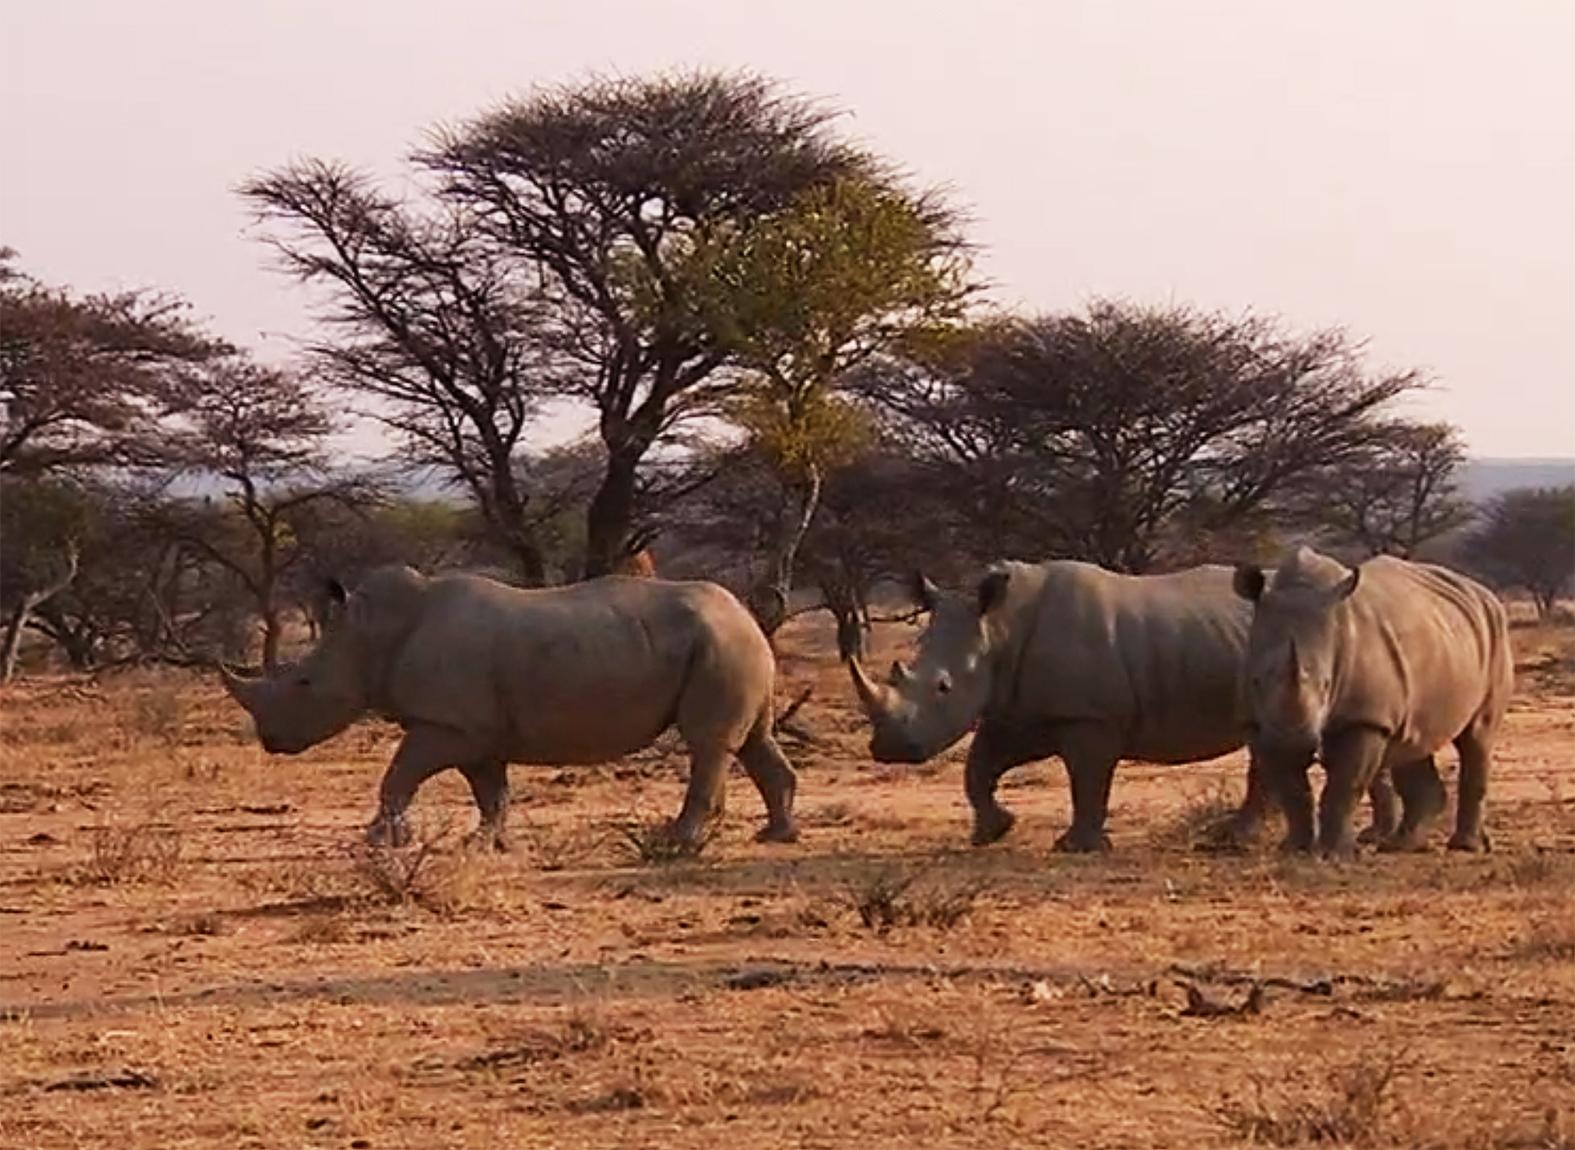 rhinoceros-photo-three-rhinoceros.jpg